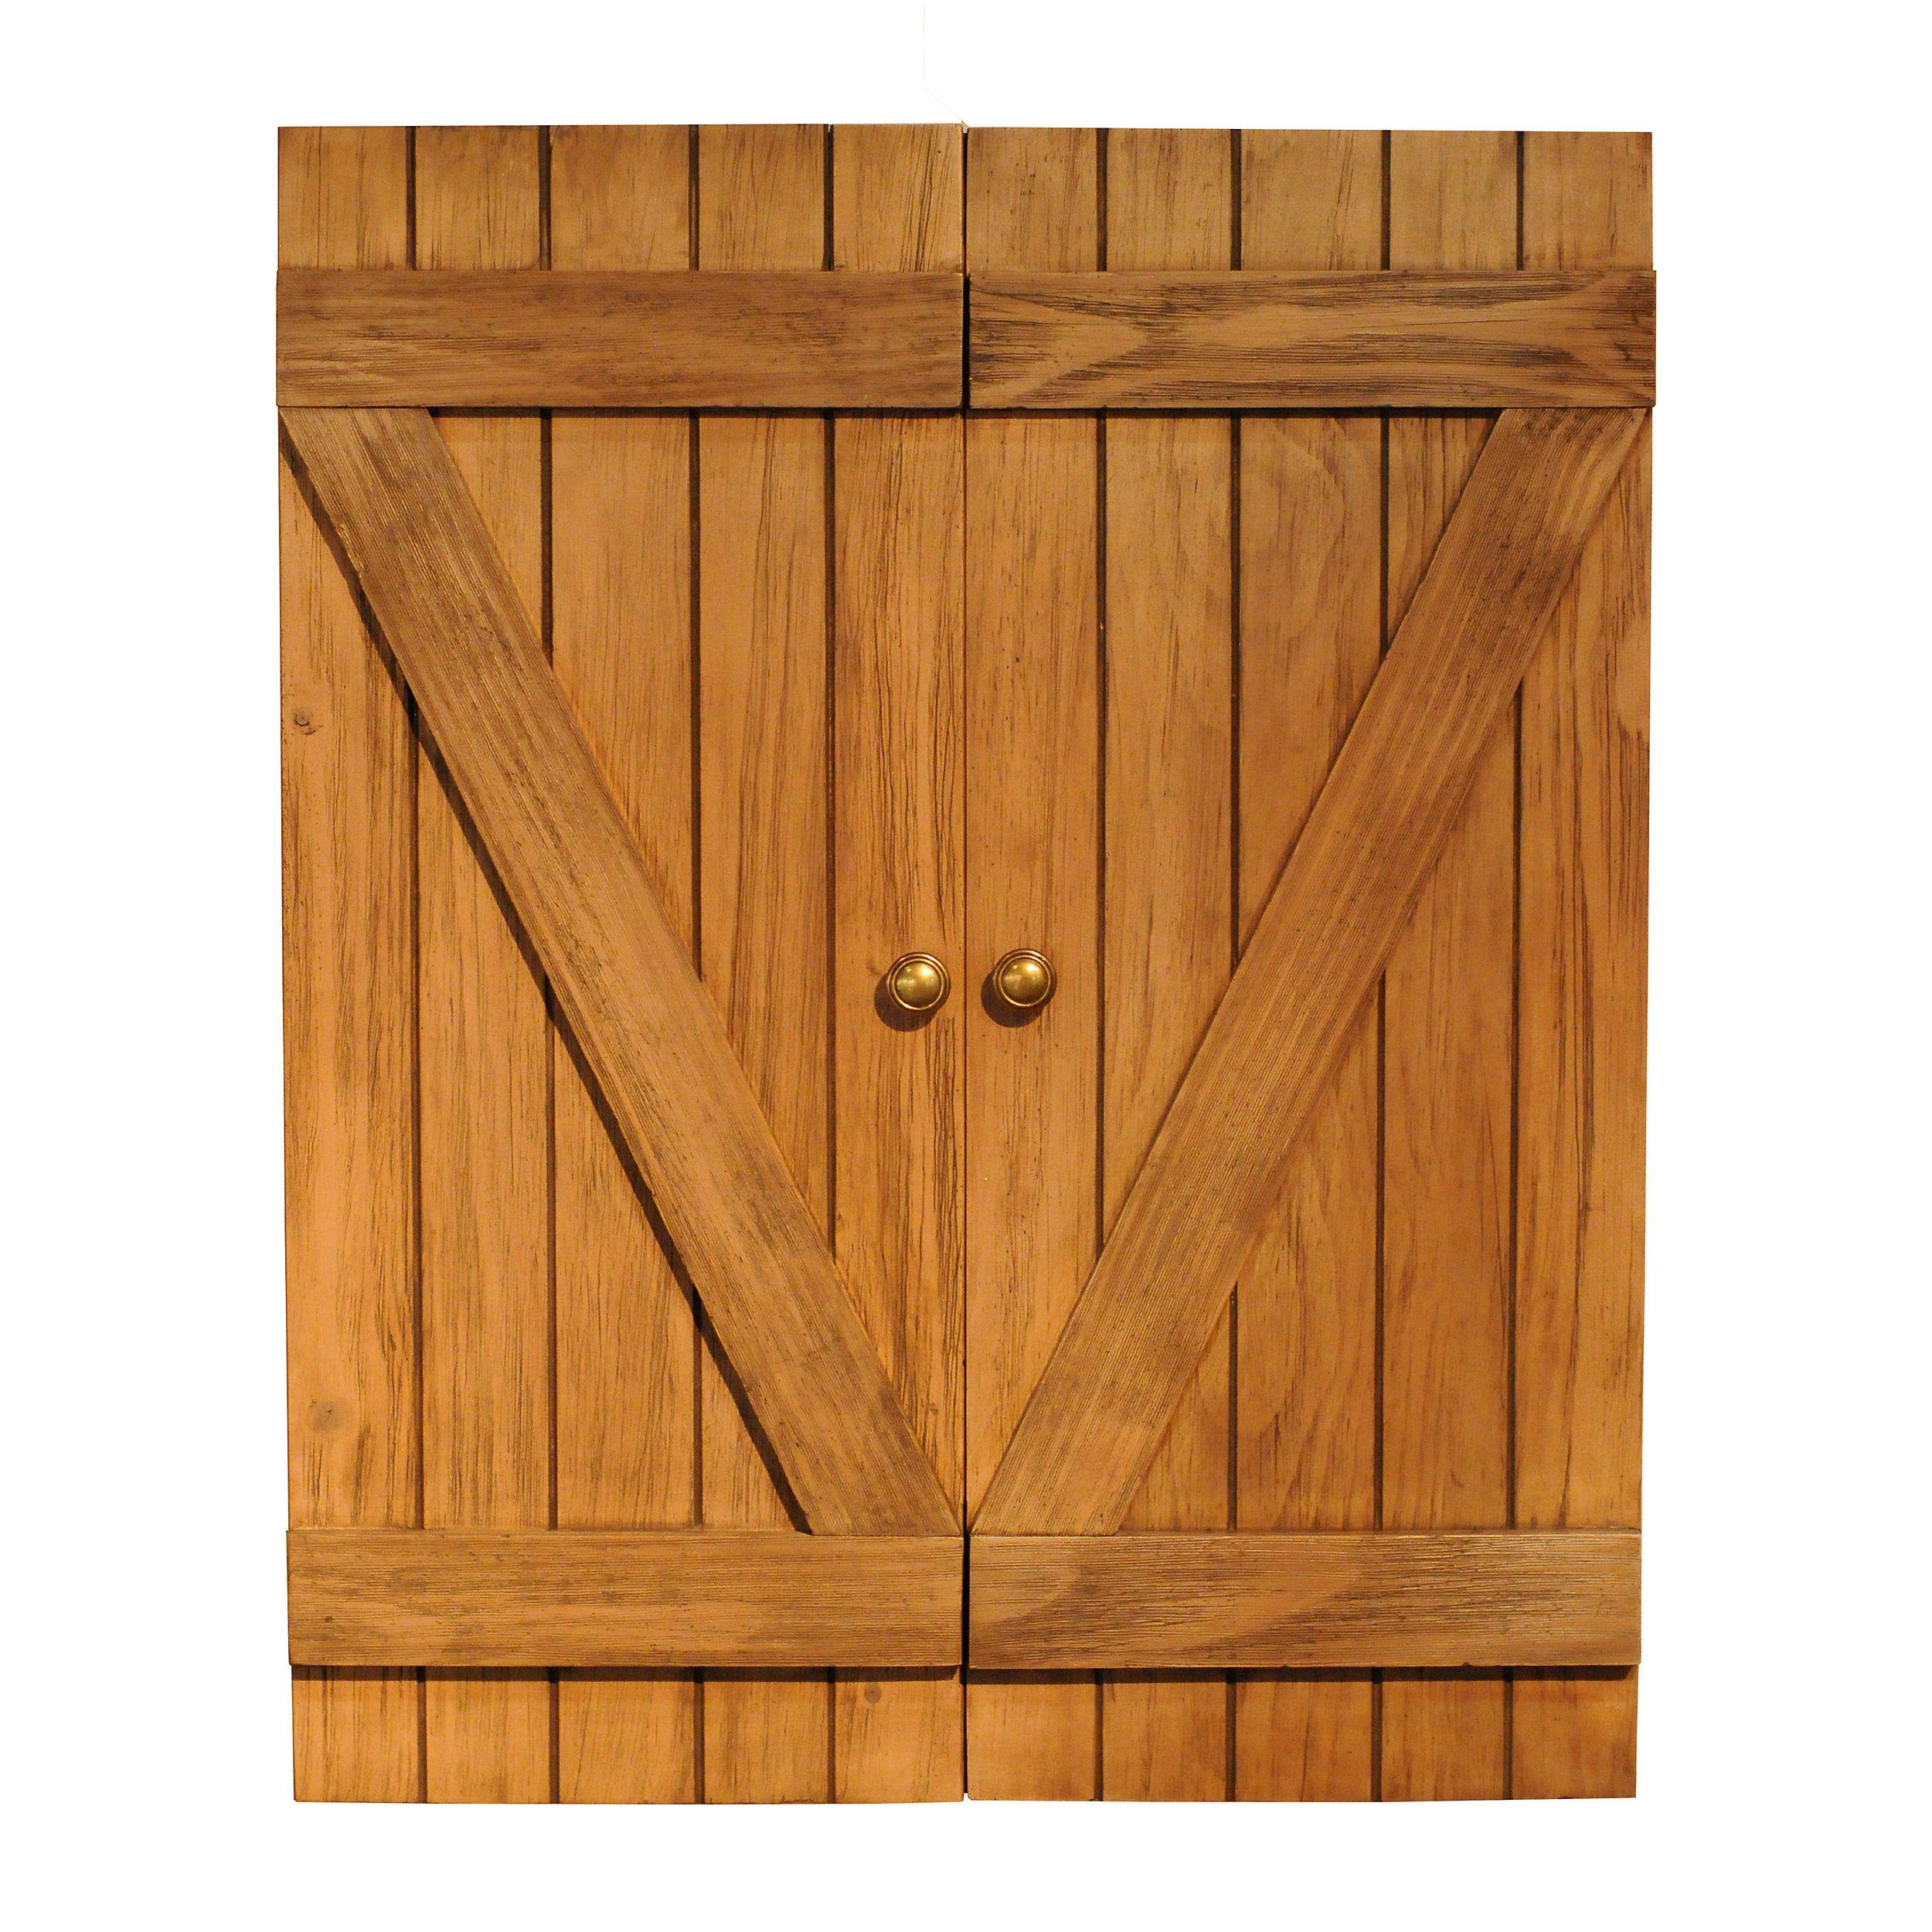 Rustic Dartboard Cabinet   Wooden Dartboard Cabinet - billiard ...